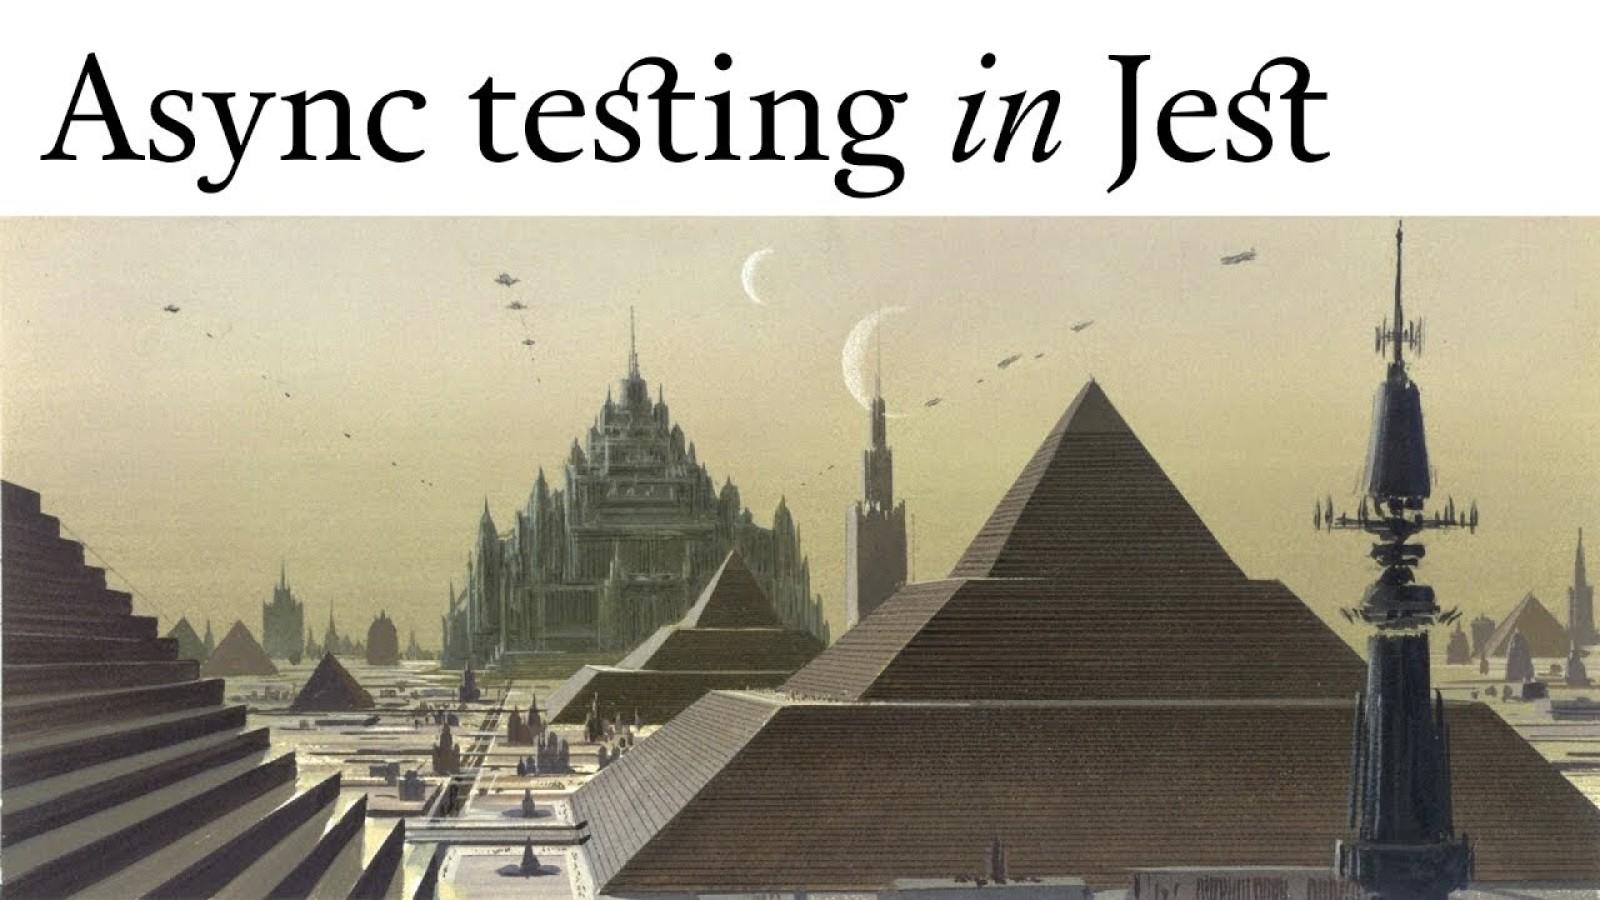 Async testing in Jest